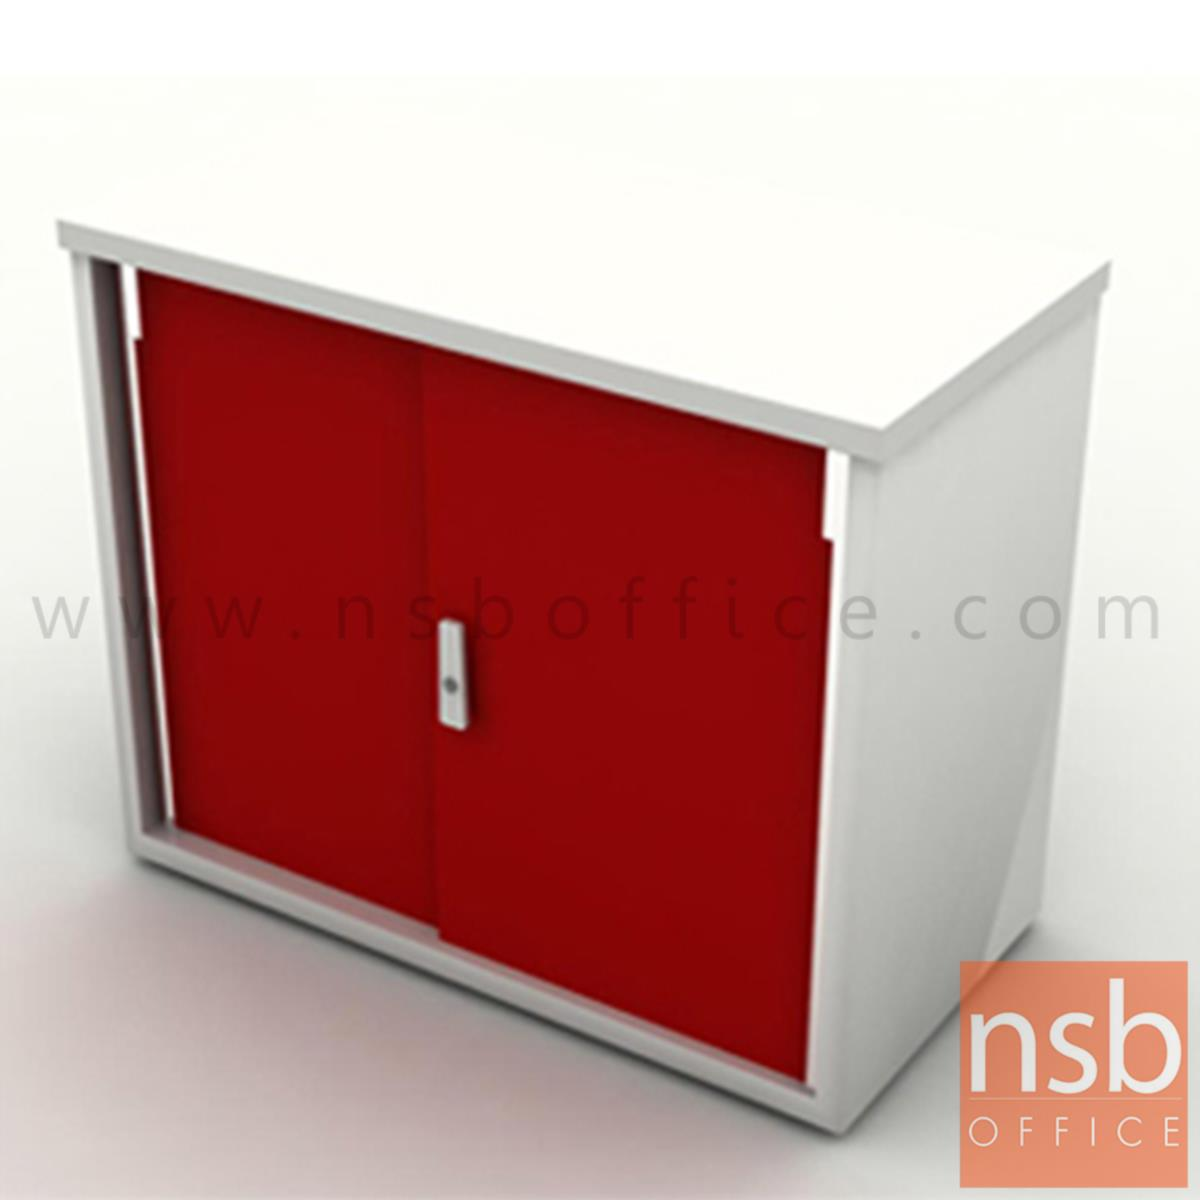 A04A062:ตู้บานเลือกเหล็กแผ่น top ไม้ รุ่น L57  มือจับโครเมี่ยม